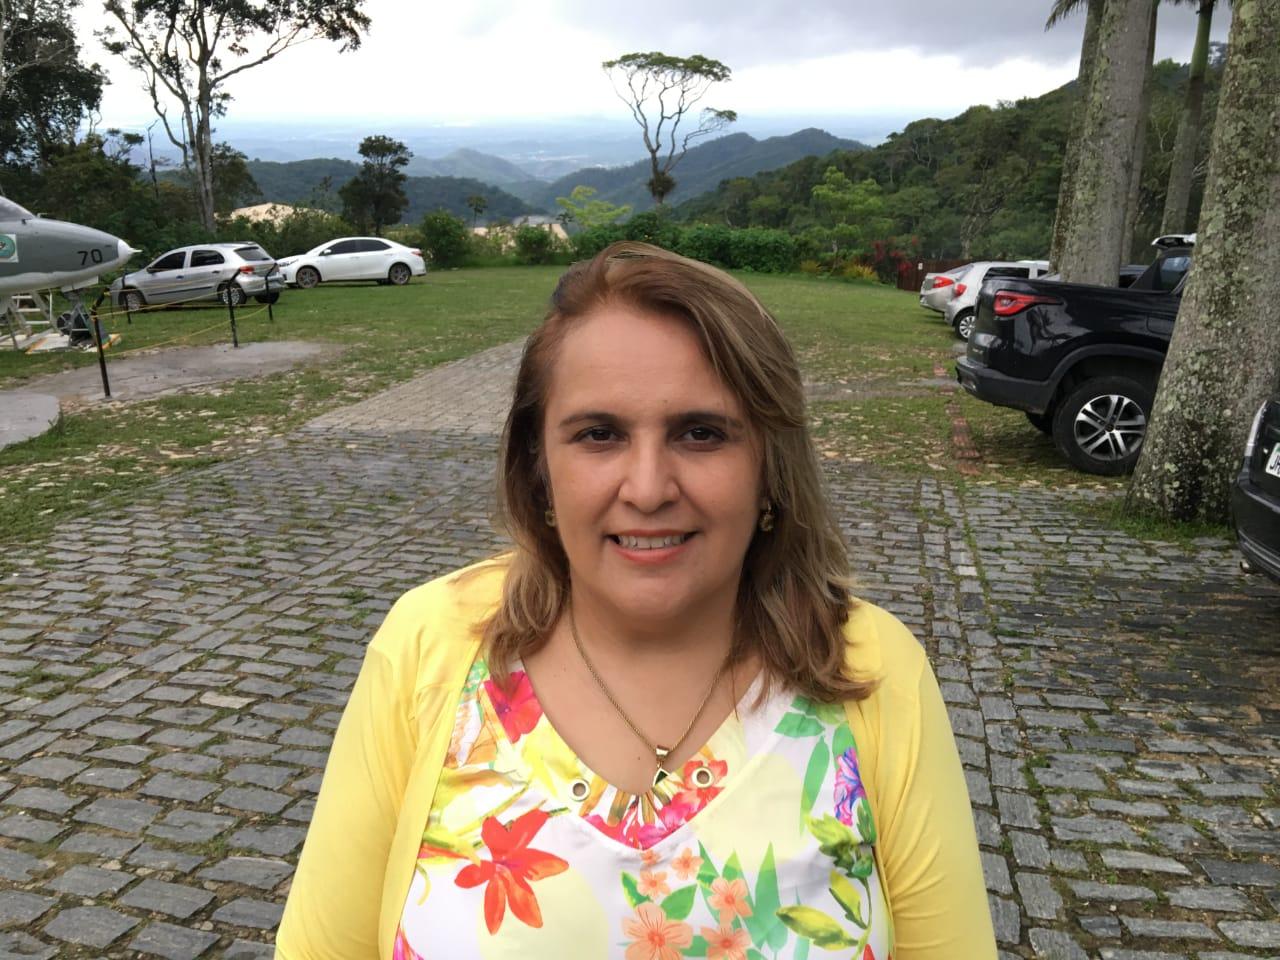 Marta Mateus